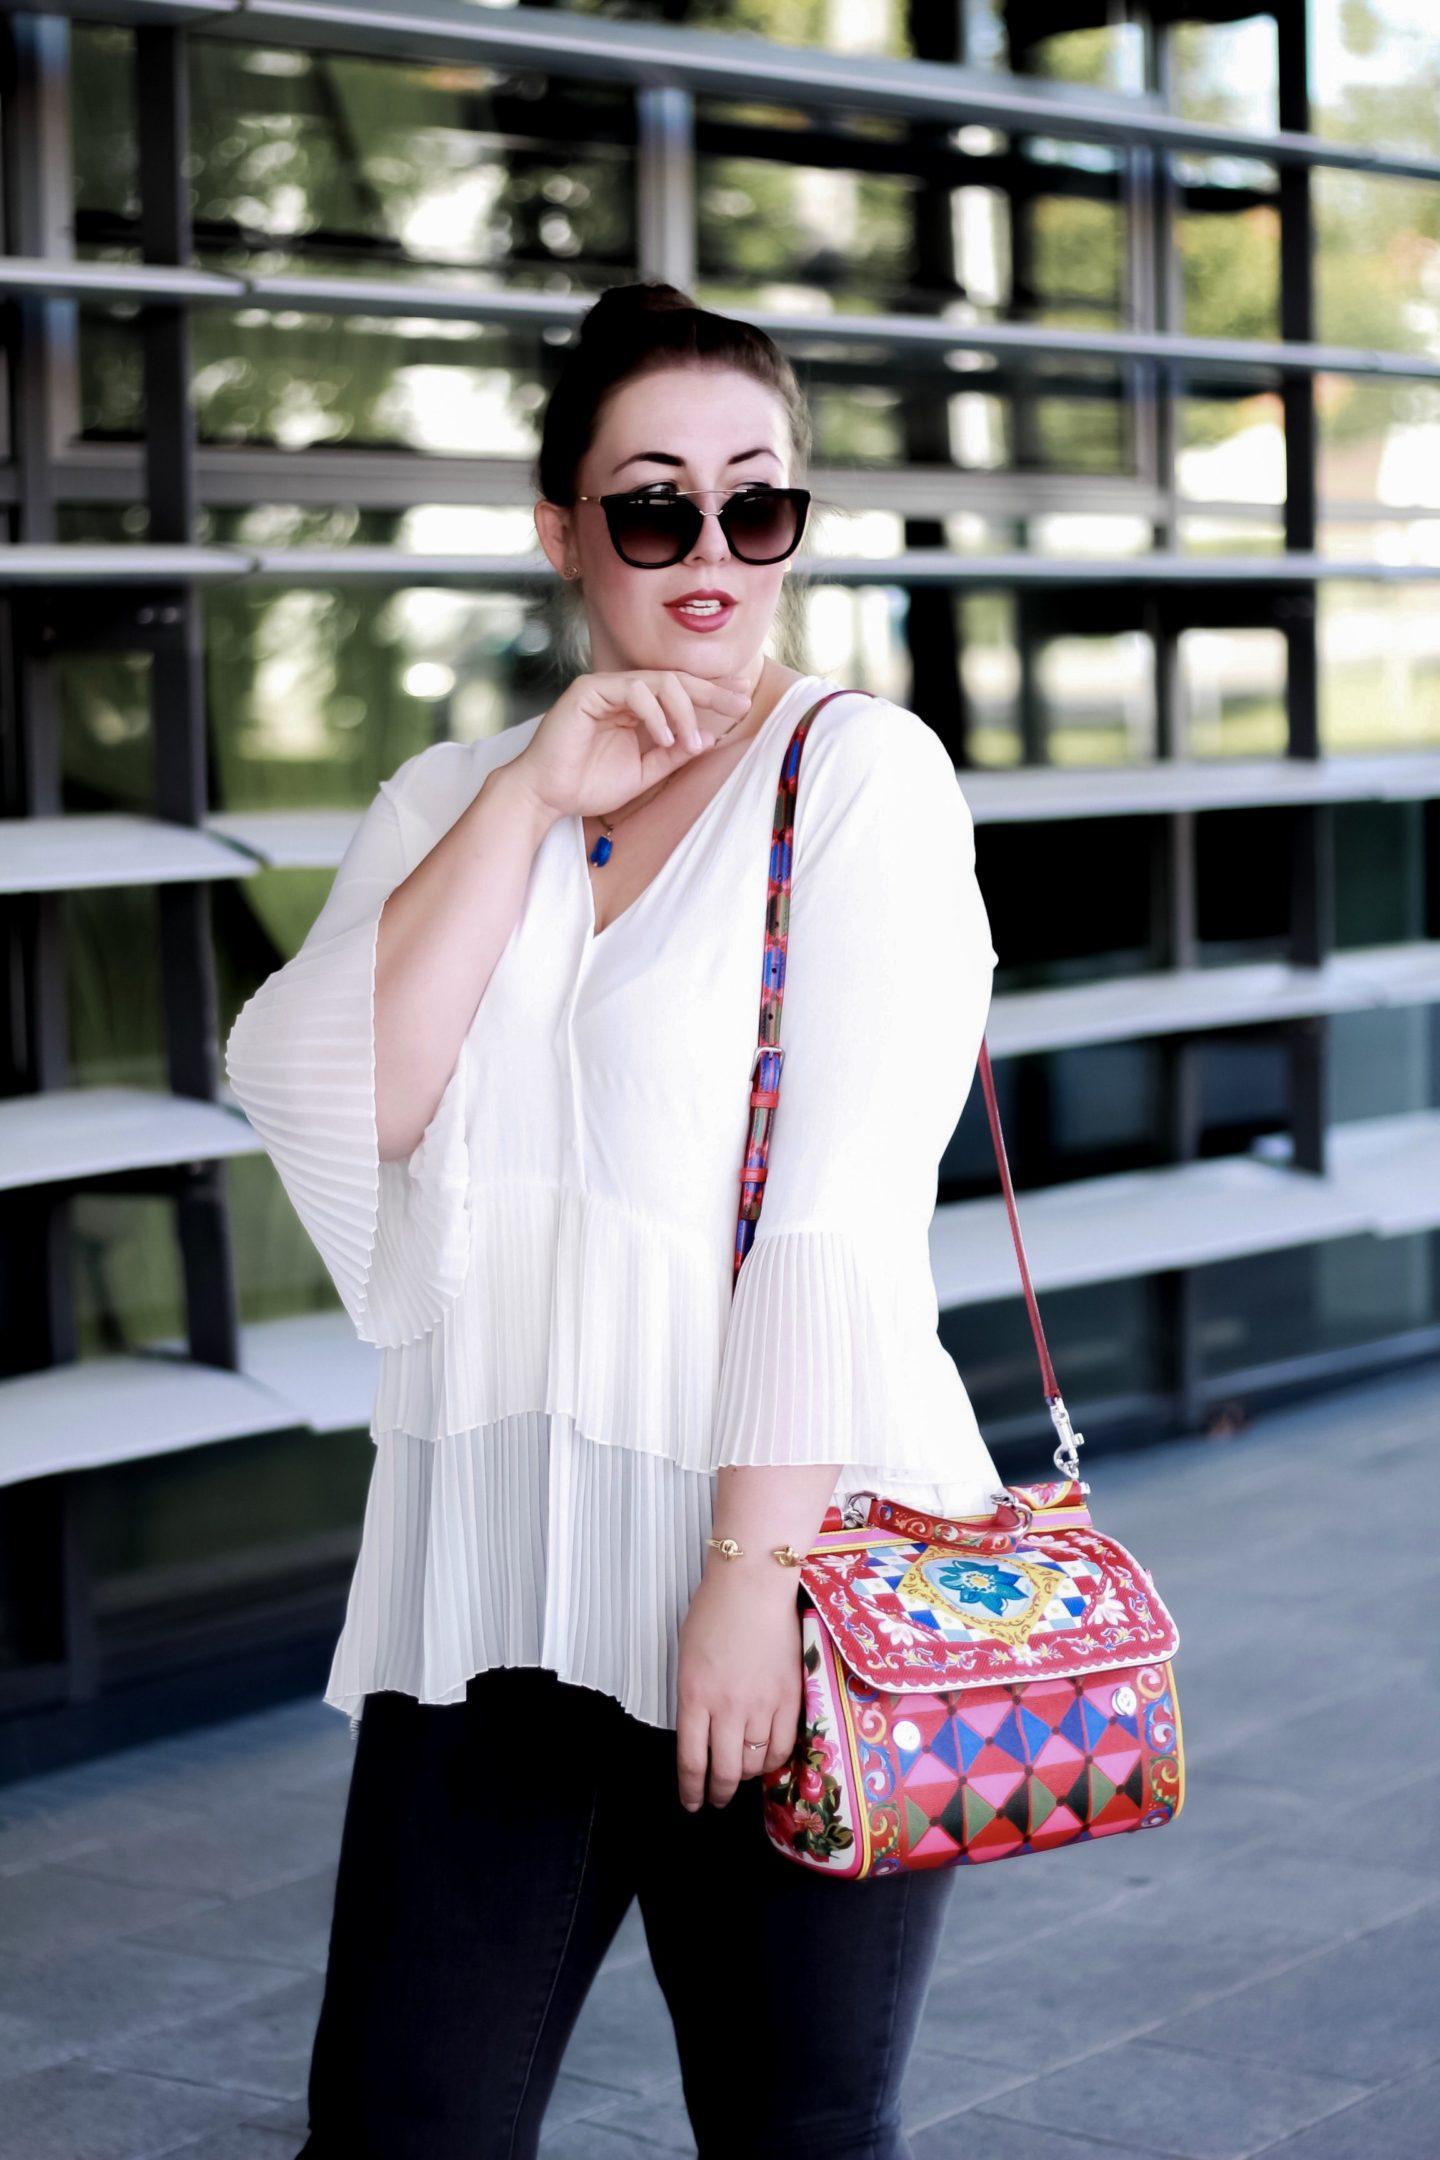 Dolce-Gabbana-Sicily-Mambo-Carretto-Plisseebluse-Zara-Miss-Suzie-Loves-Susanne-Heidebach-Fashionblogger